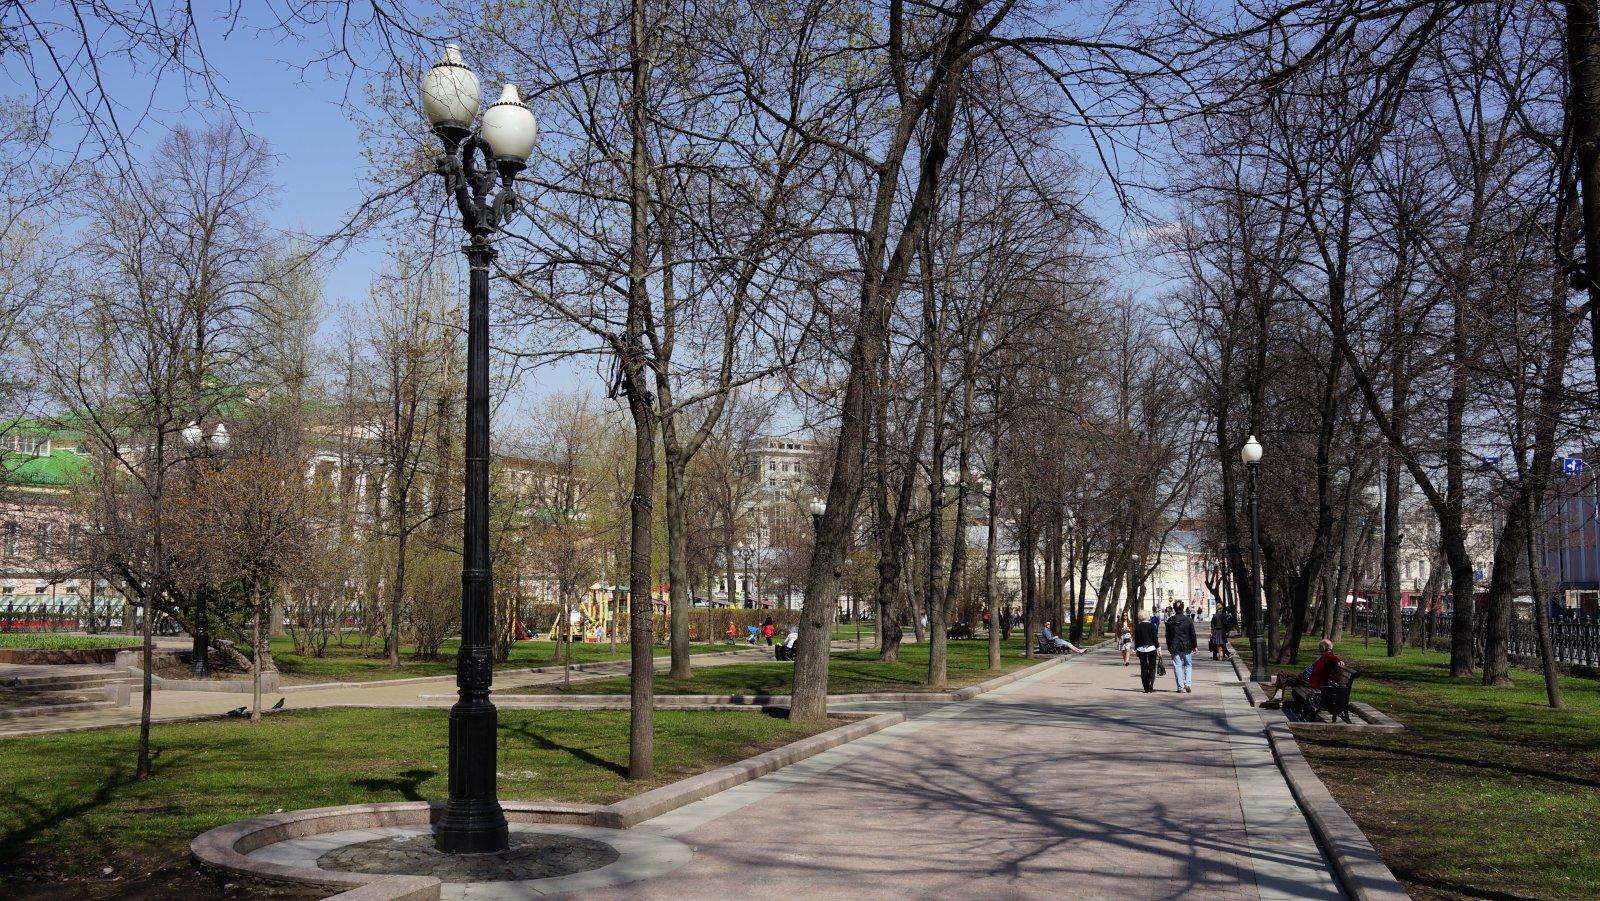 на_Петровском_бульваре,_г._Москва_30_04.2017_г.JPG